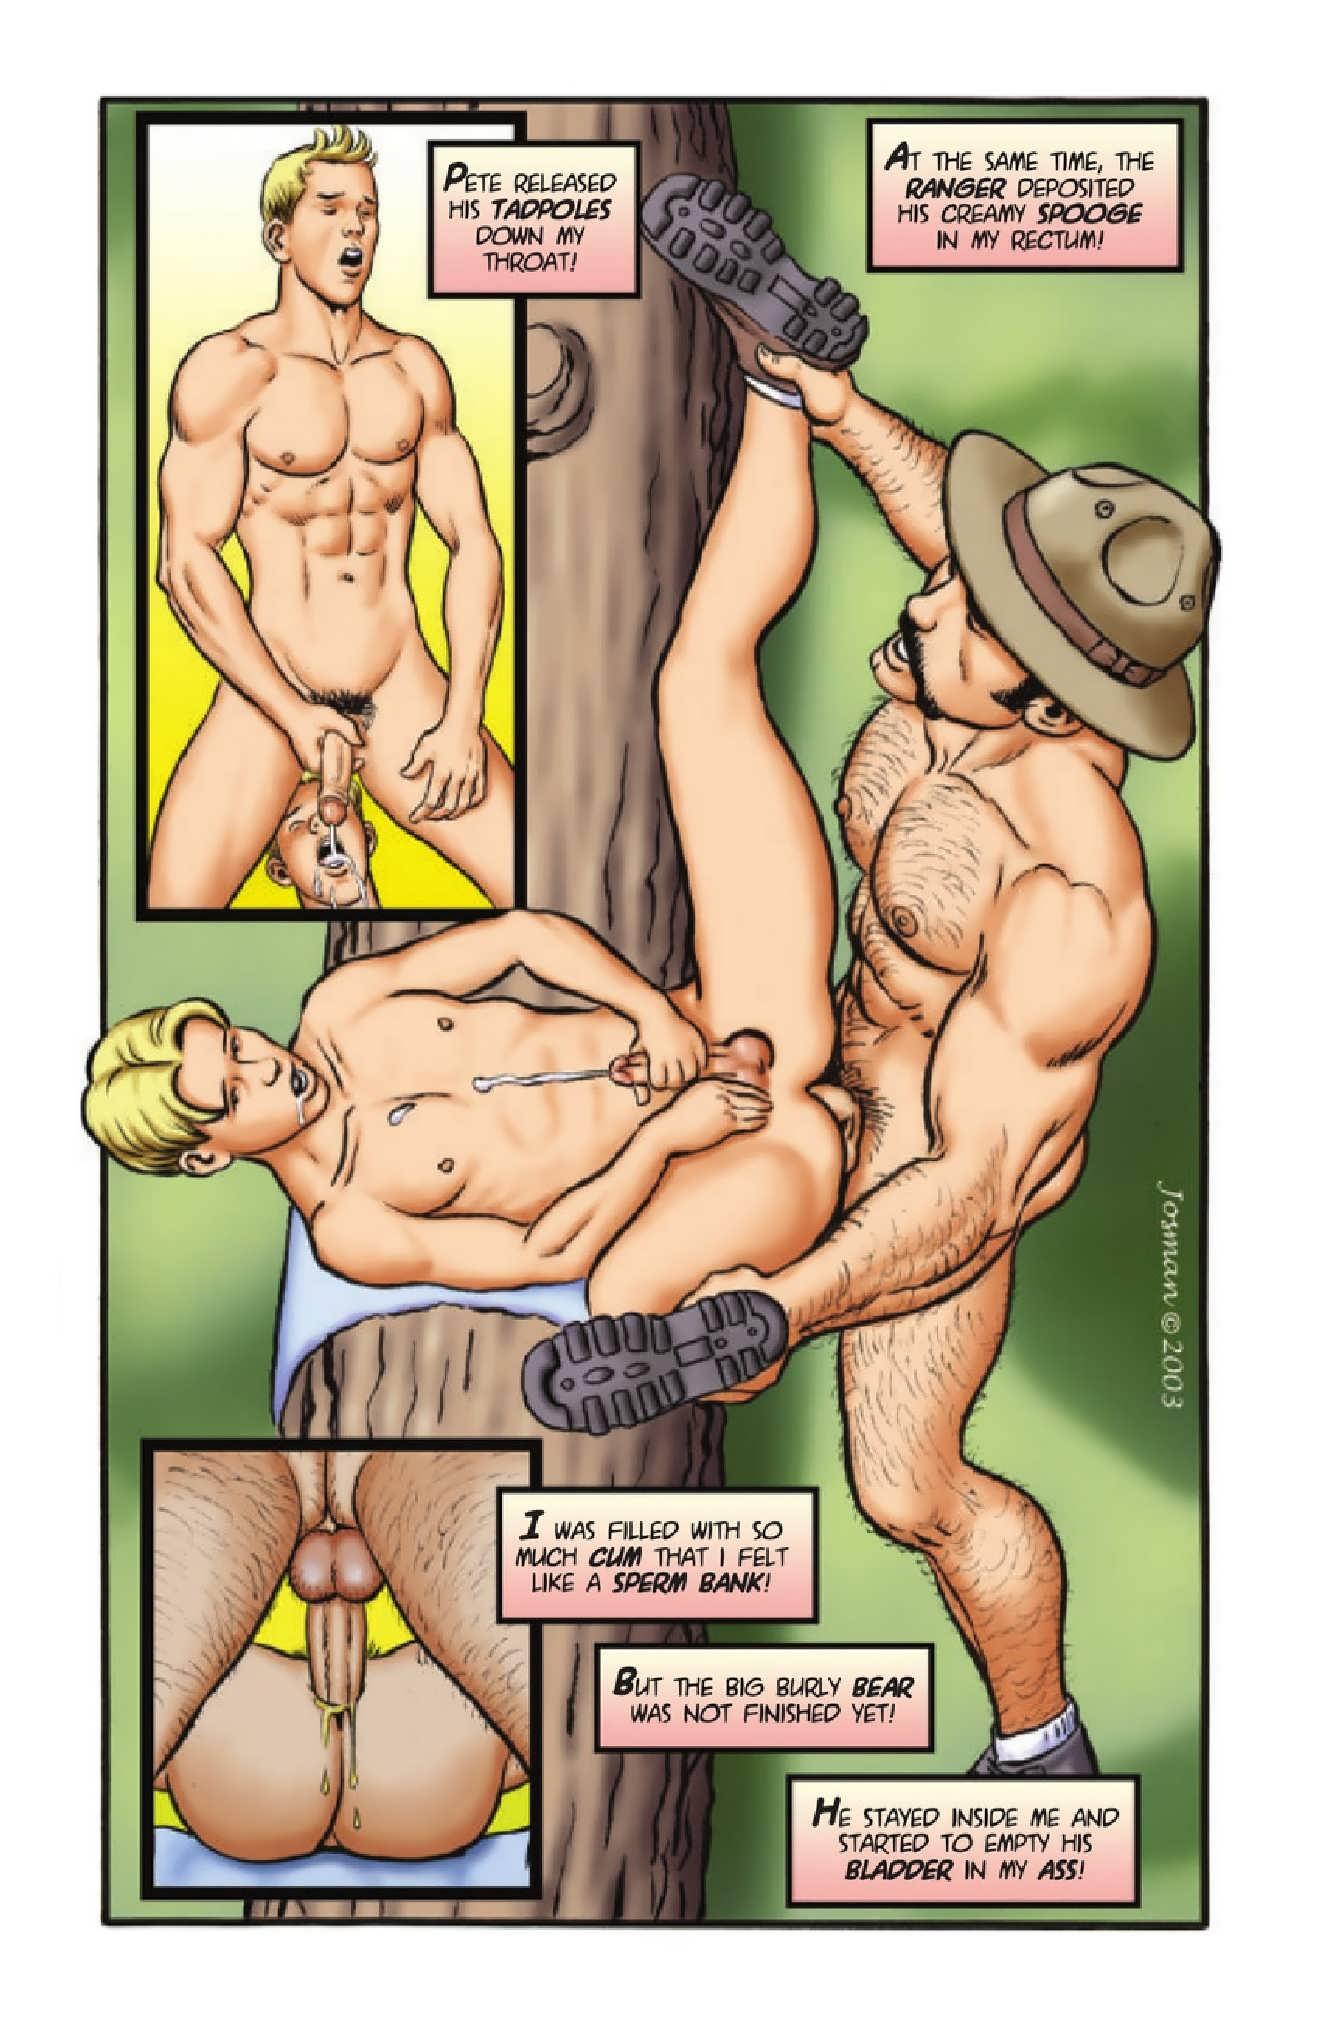 Free gay minion cartoon porn hentia movies